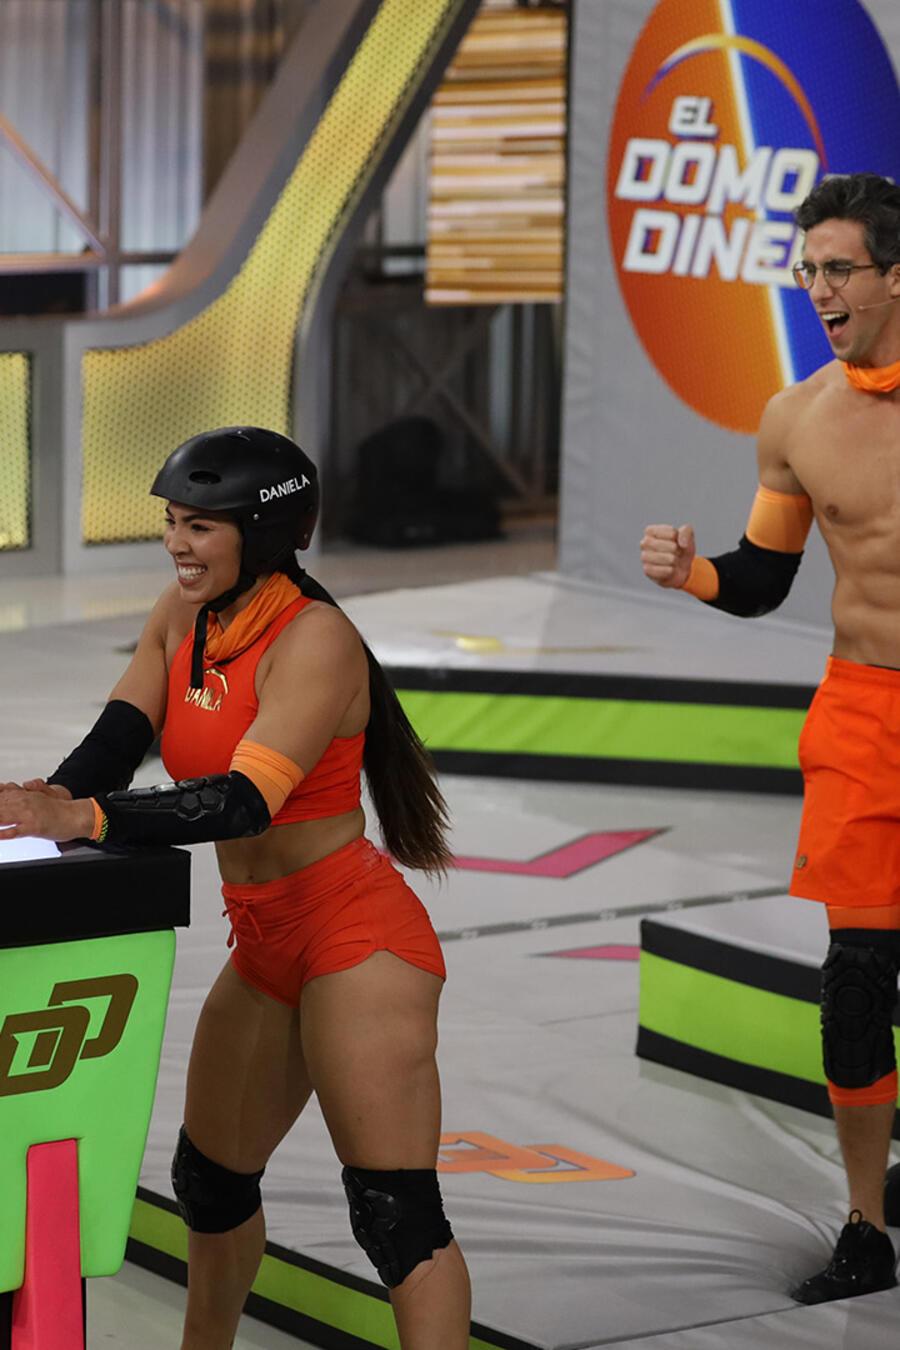 Daniela venció a Erika en el Circuito Final, El Domo del Dinero